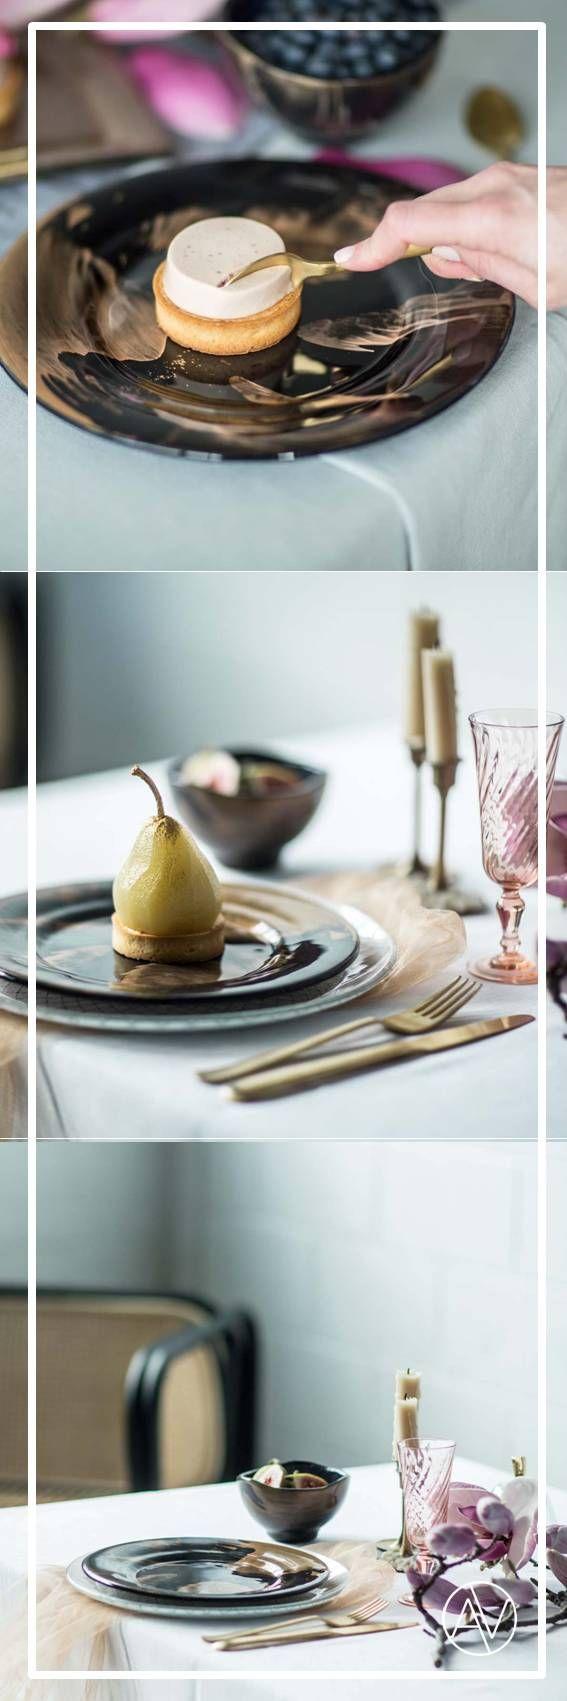 Hypnotizing dinner plate sets in dark blue with gold splashes